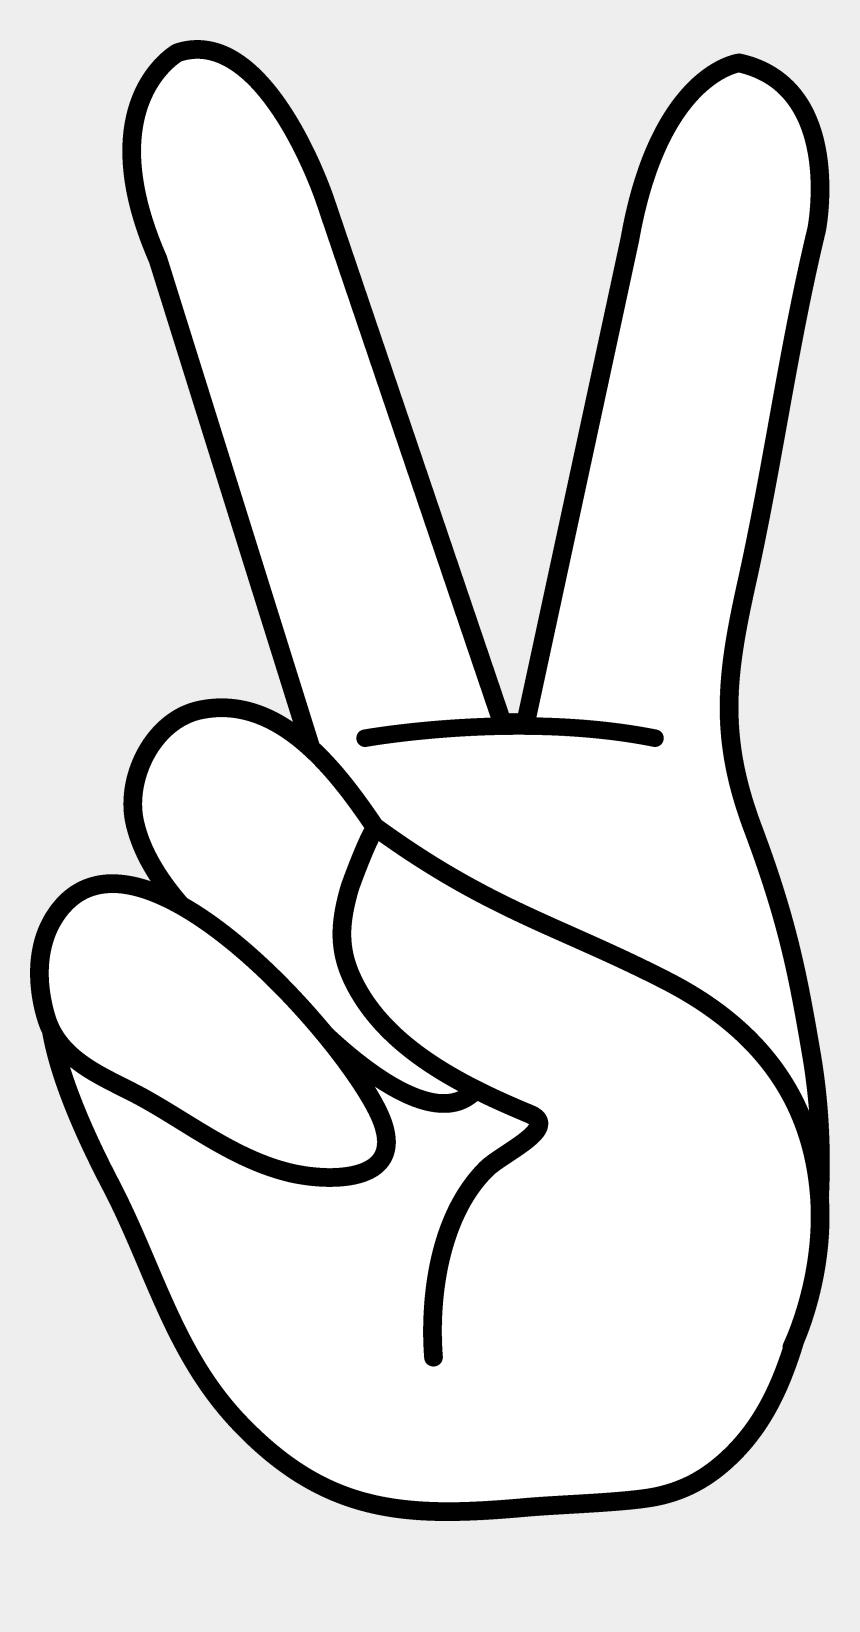 peace clipart, Cartoons - Clipart Info - Clipart Peace Sign Hand